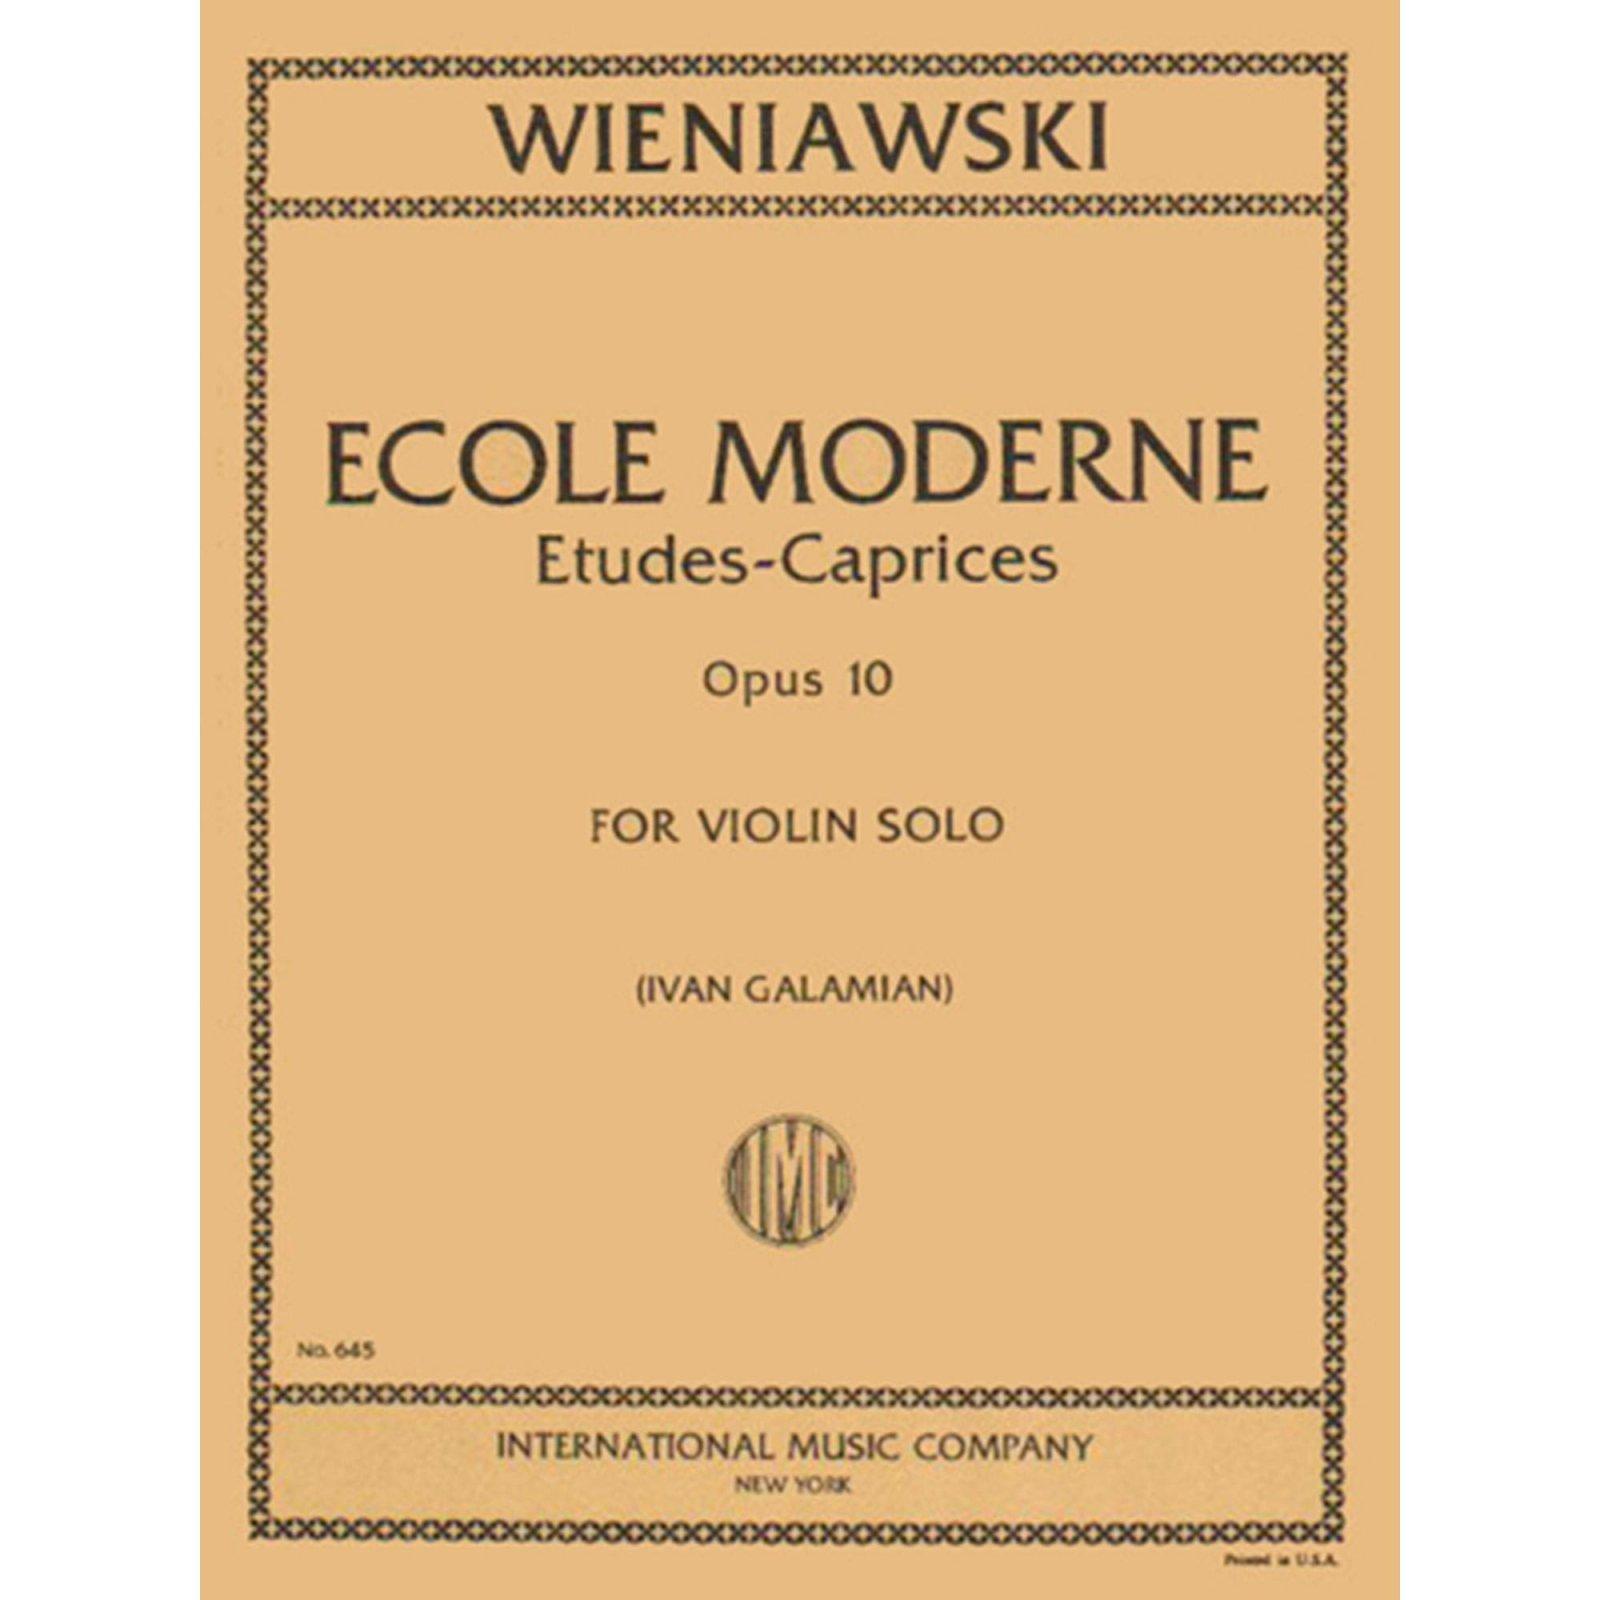 Wieniawski: Ecole Moderne, Op.10, Ed. Galamian (International)